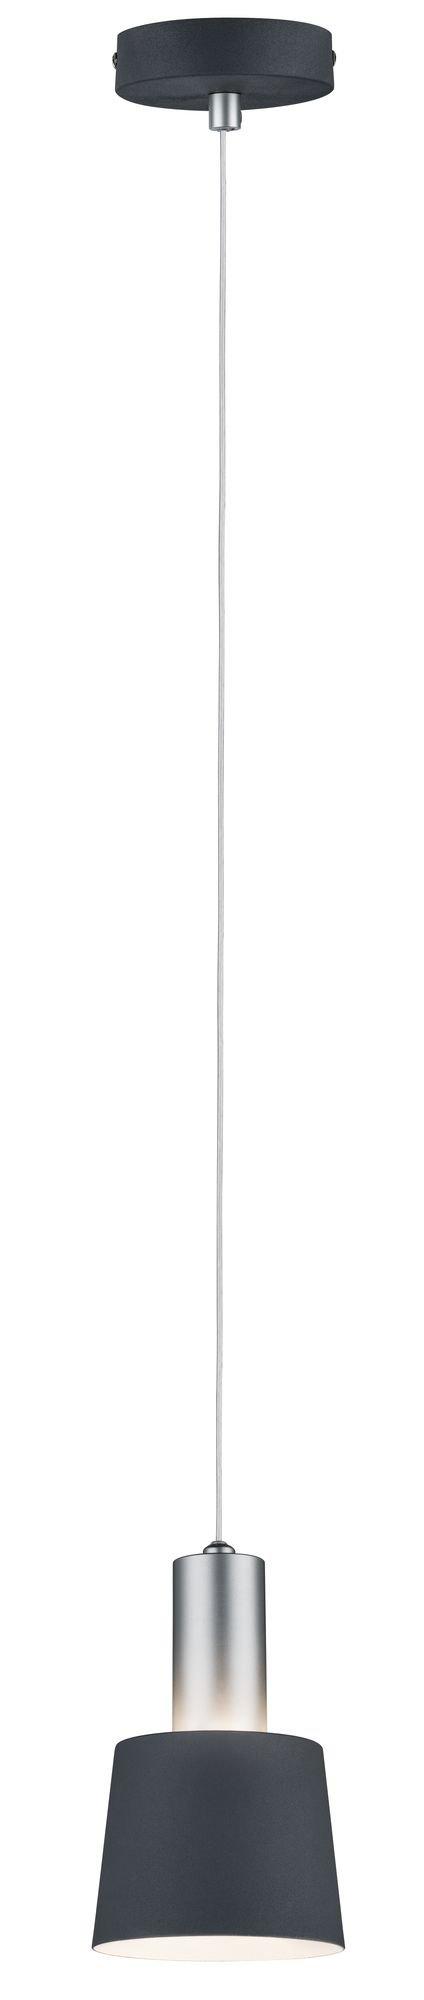 Neordic Pendelleuchte Haldar E14 max. 20W Dunkelgrau/Chrom matt Metall